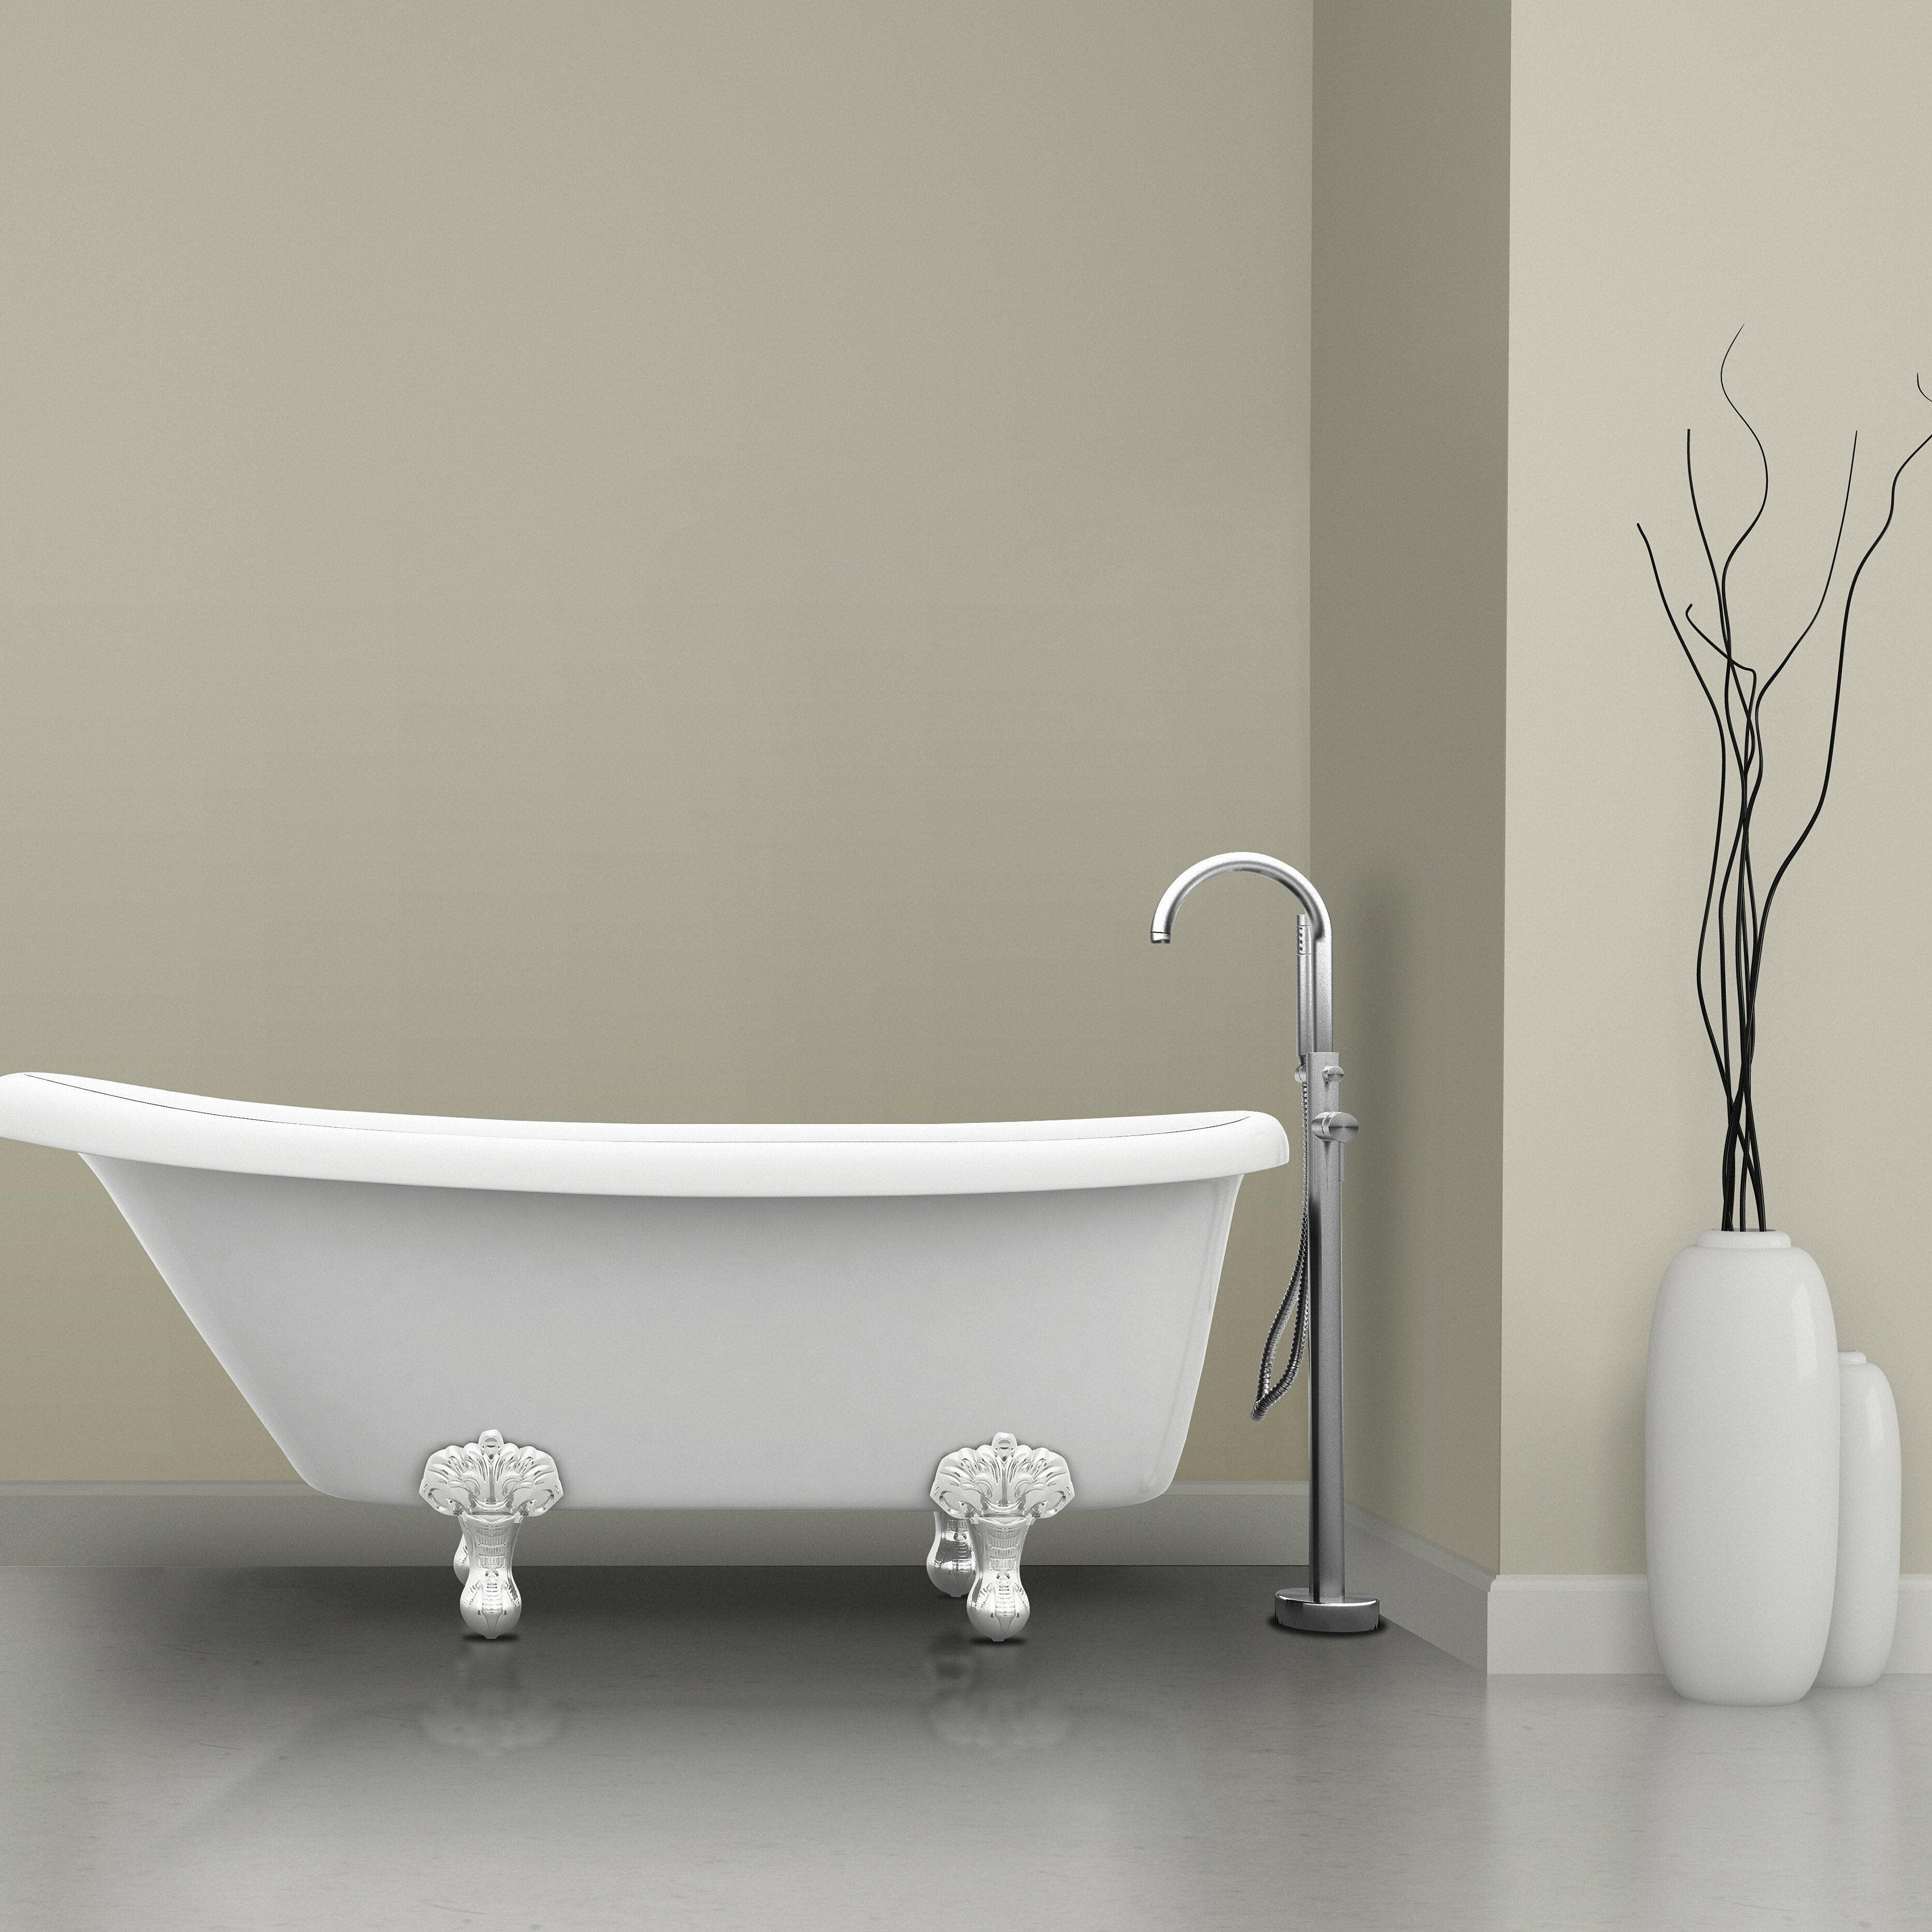 Ancona Prima Single Handle Floor Mount Bathtub Faucet With